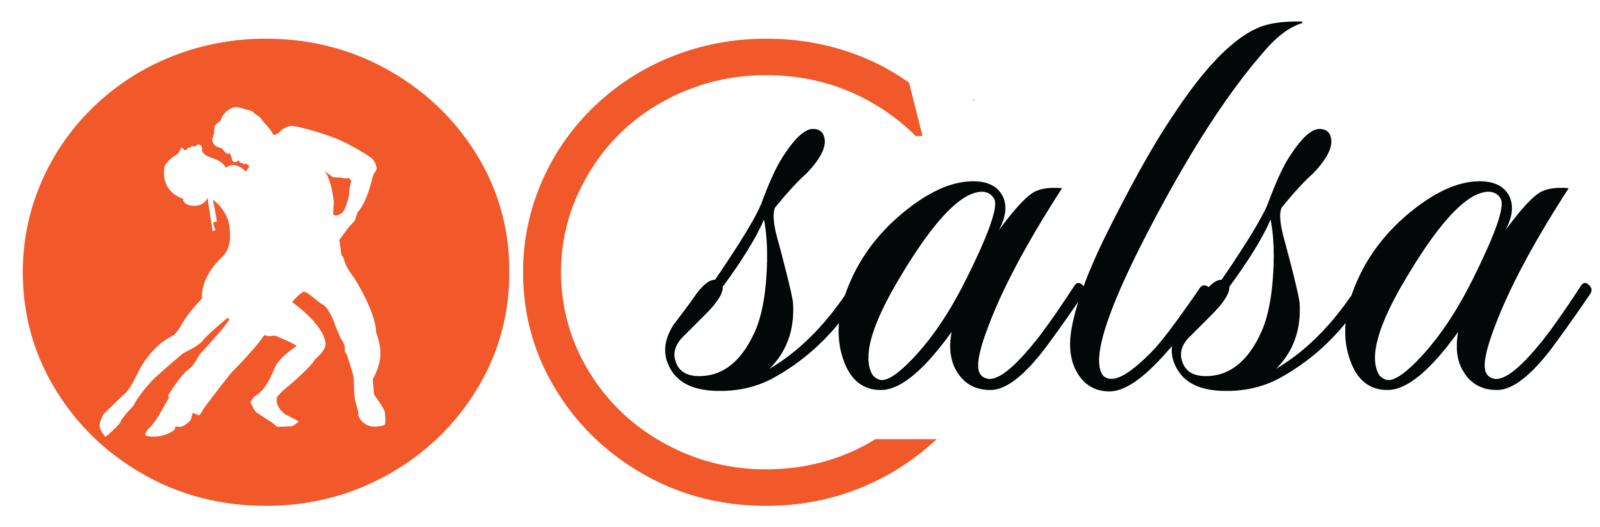 OC Salsa